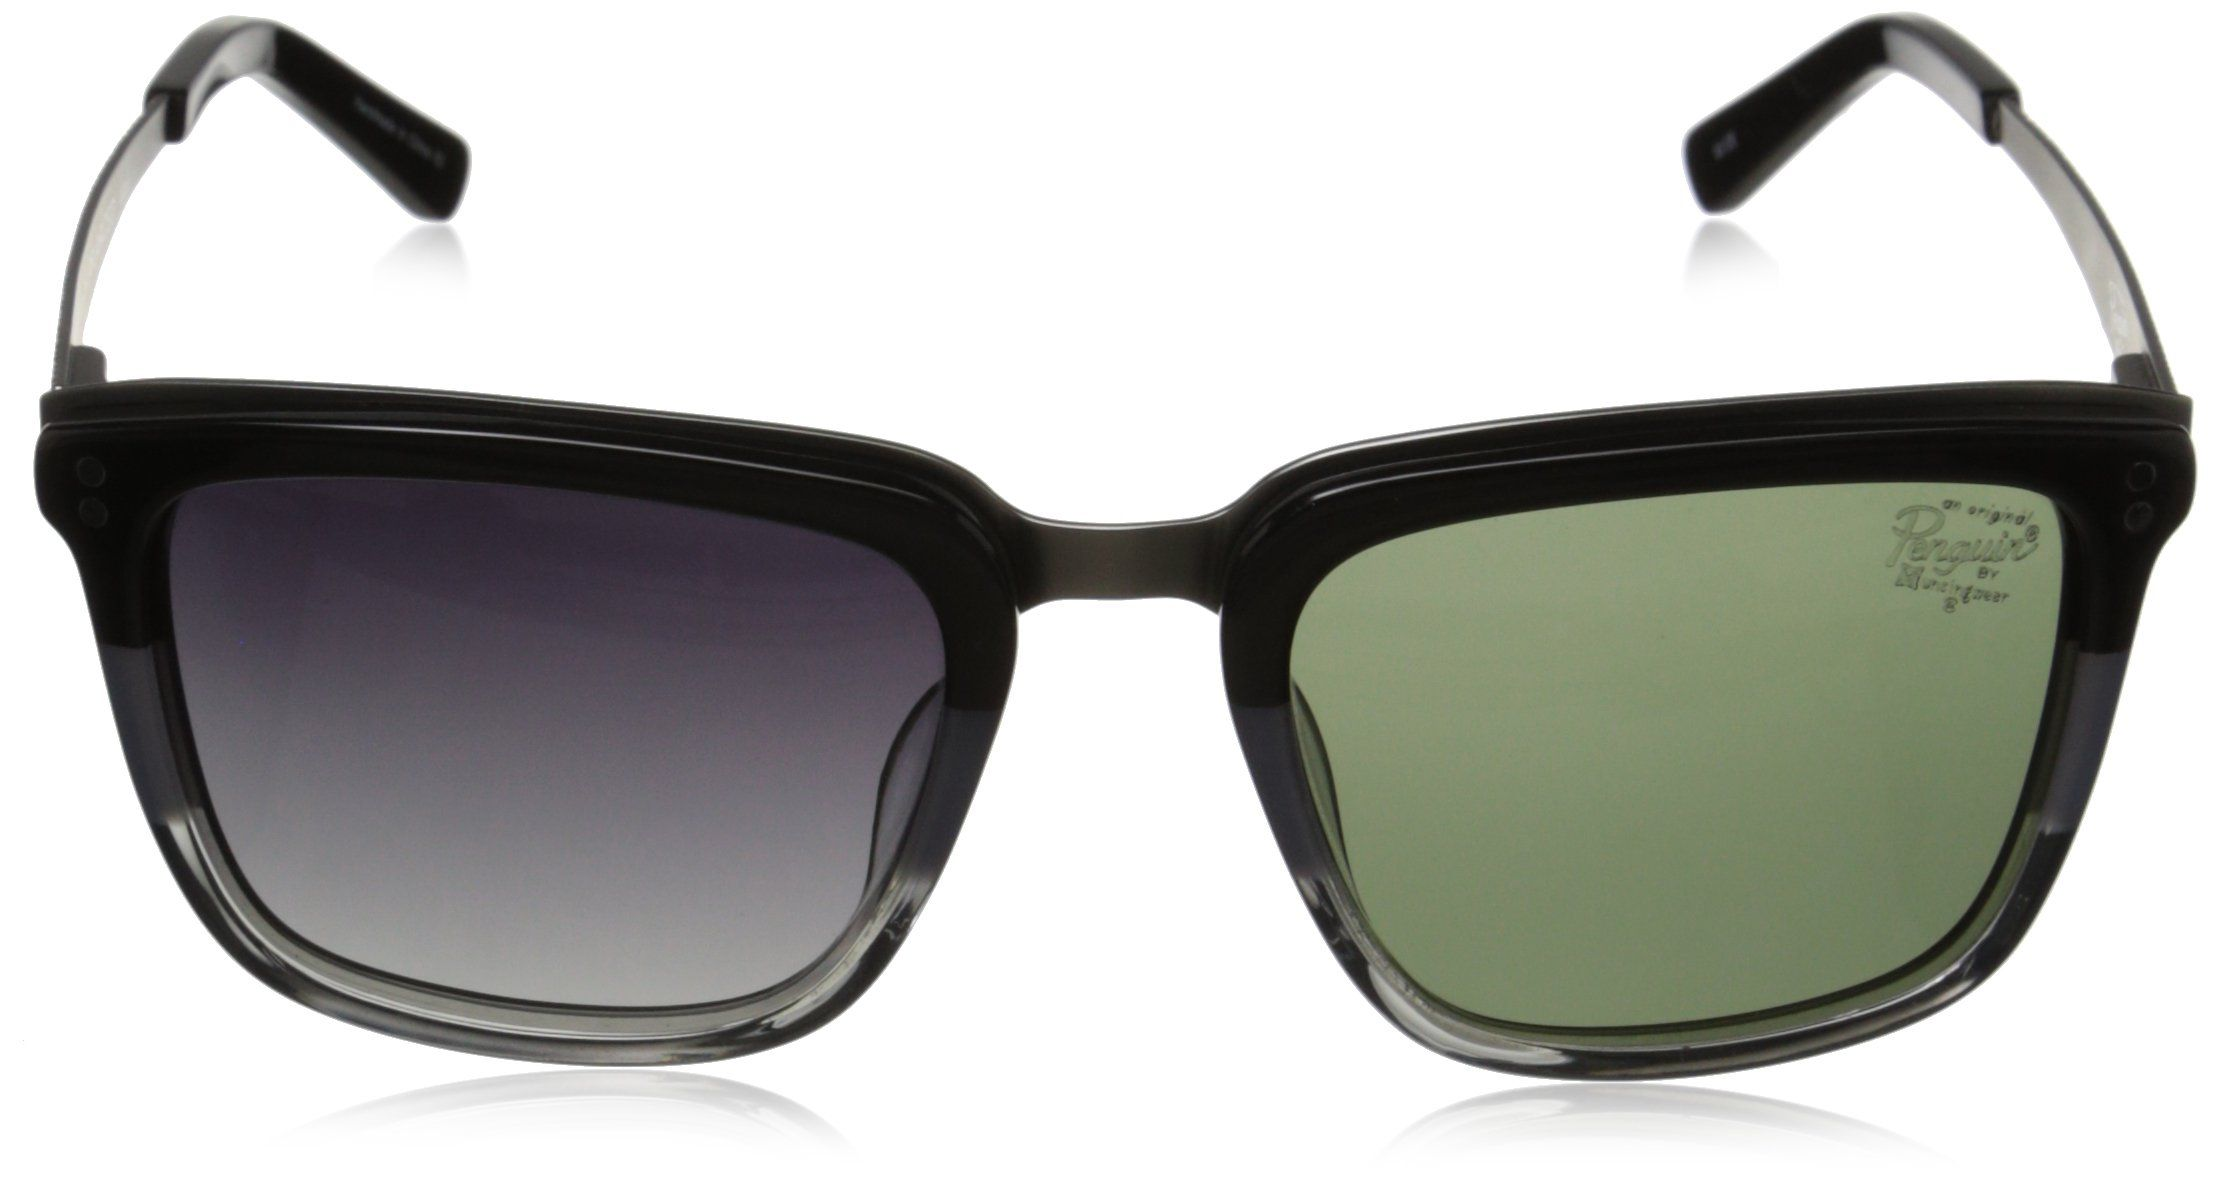 3dda7999ad7f Original Penguin Mens The Brooklyn Polarized Sunglasses Black Tin Grey  ClearMatte Gunmetal and Smoke One Size